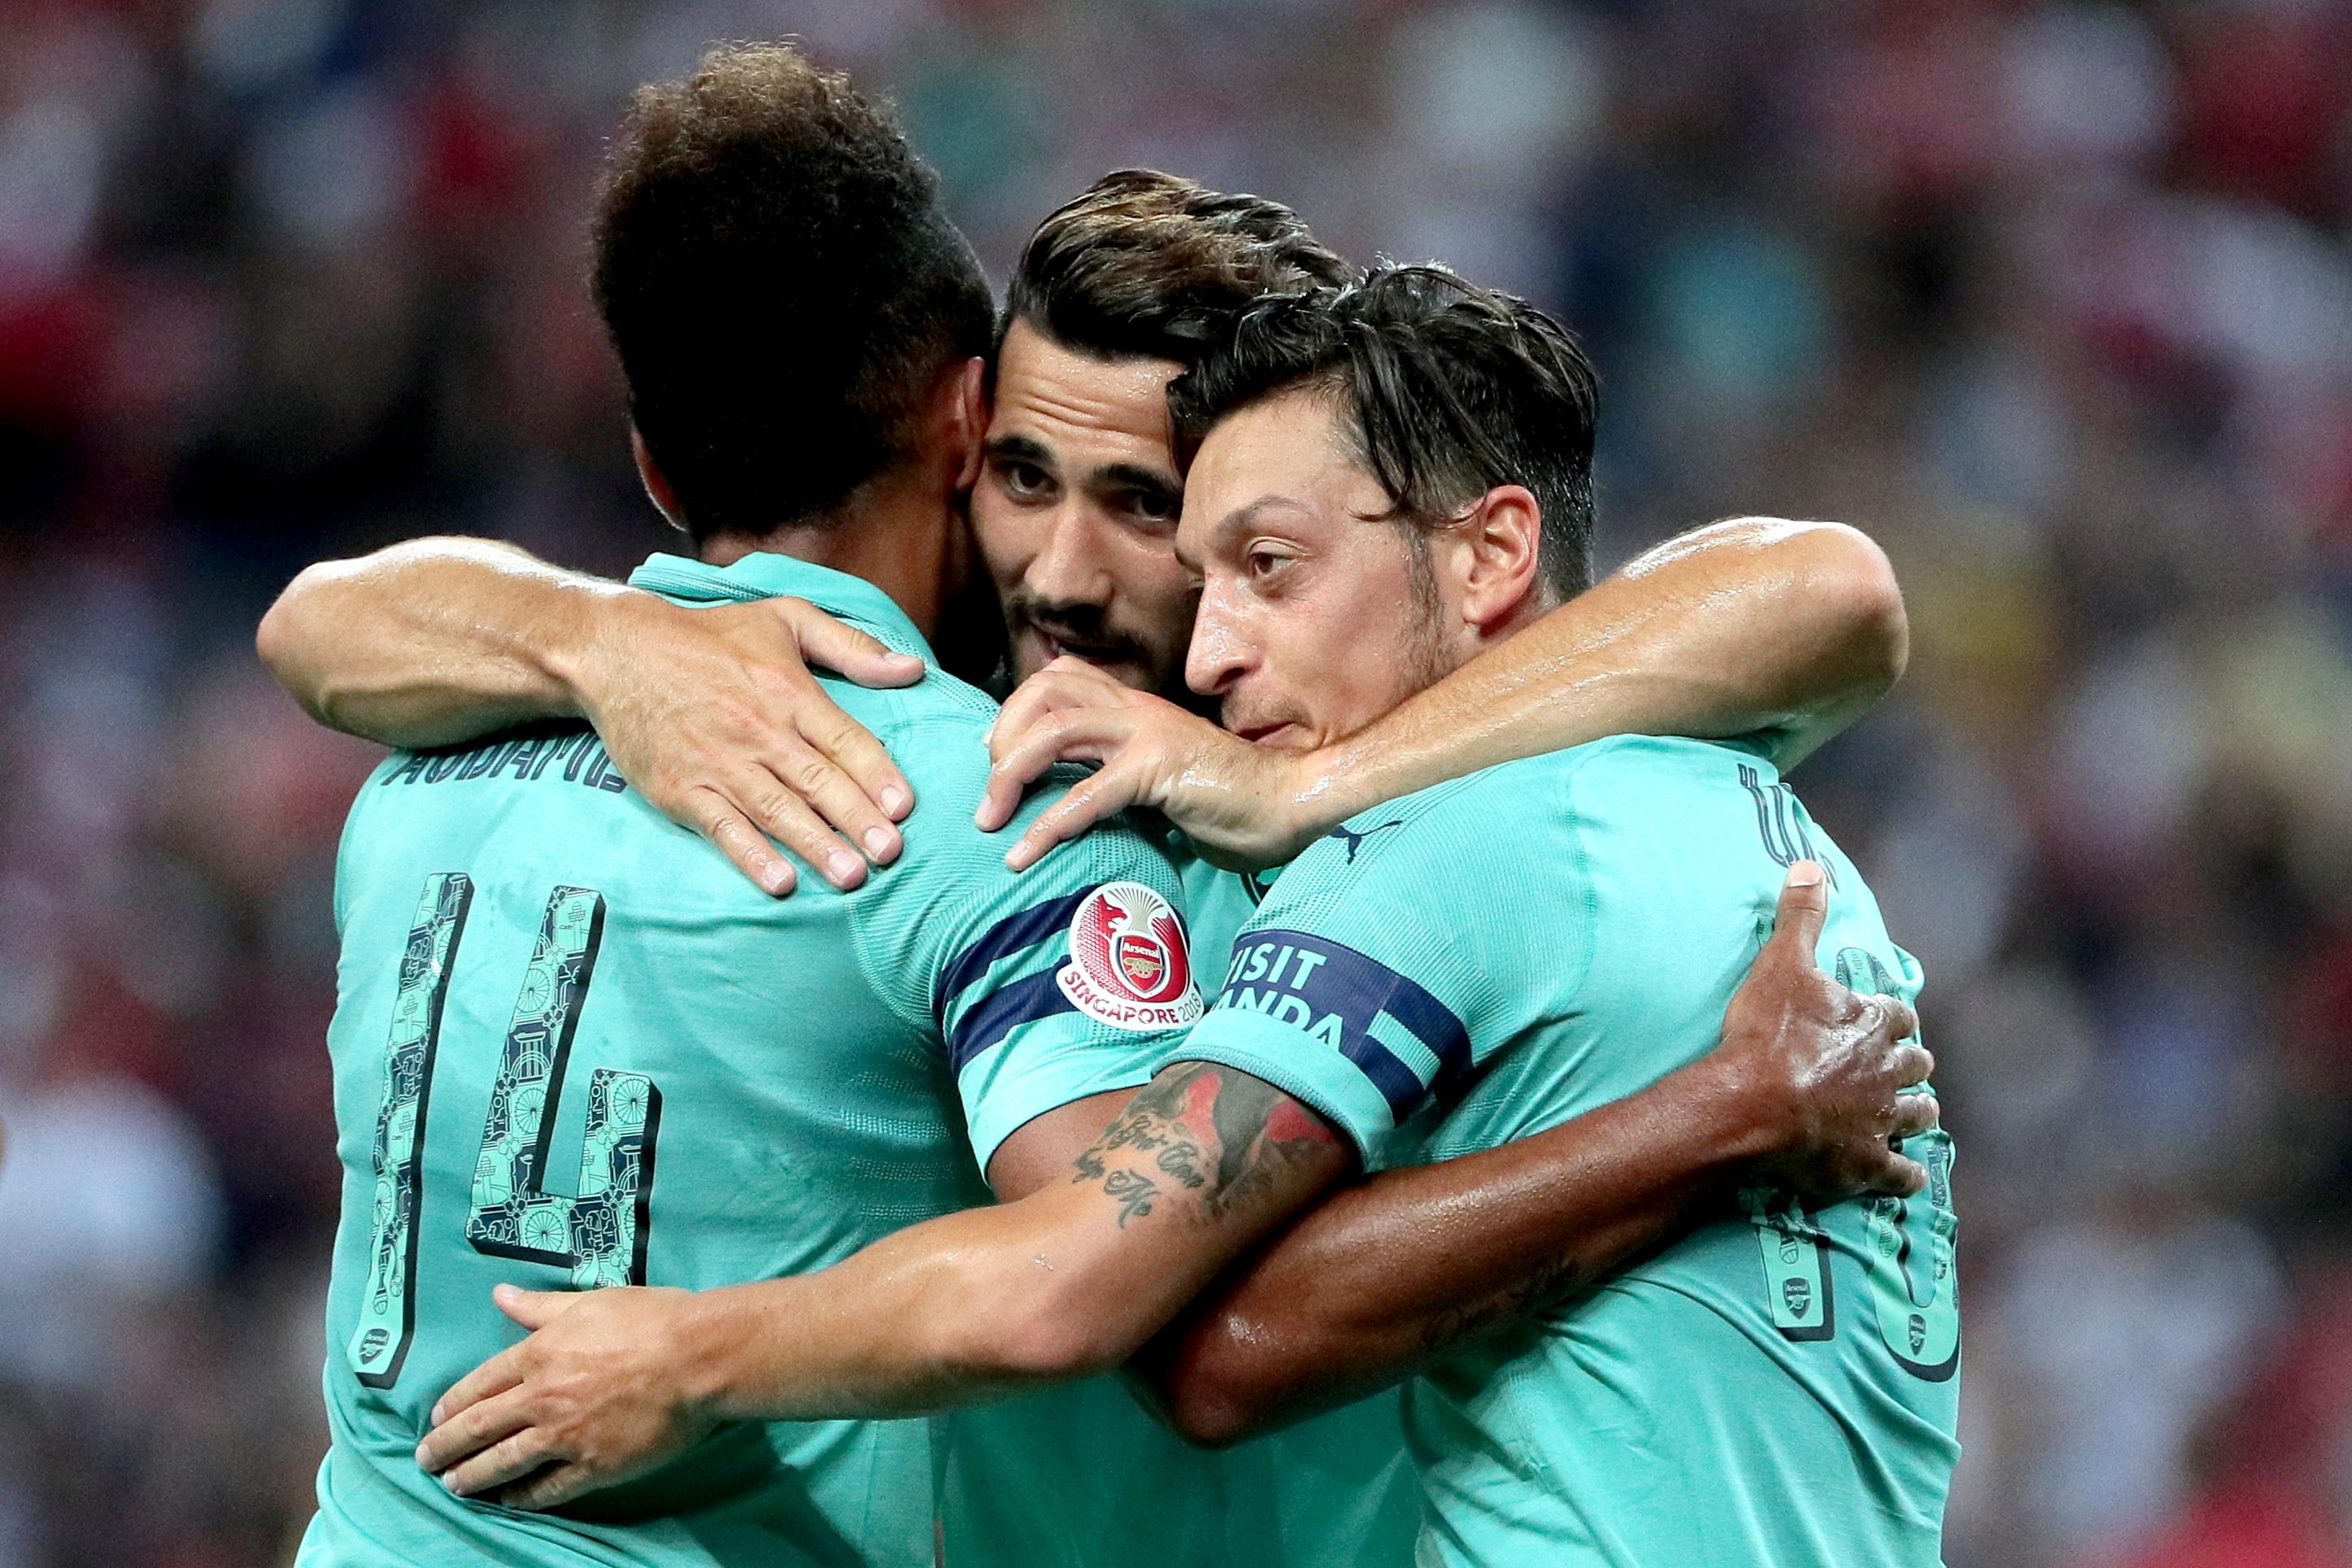 Arsenal deklasirao PSG 5:1